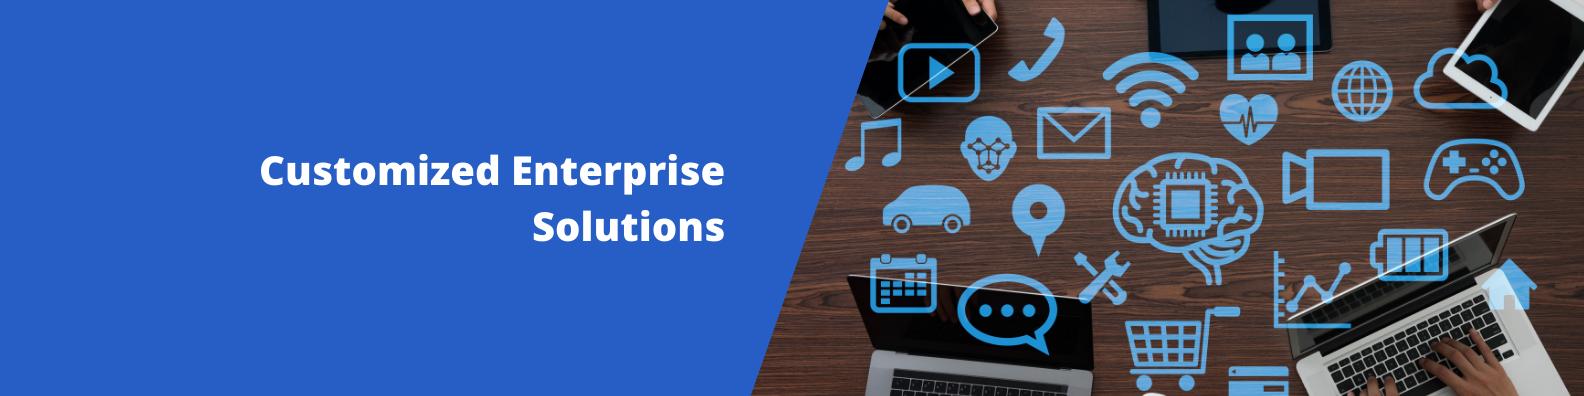 Customized Enterprise Solutions